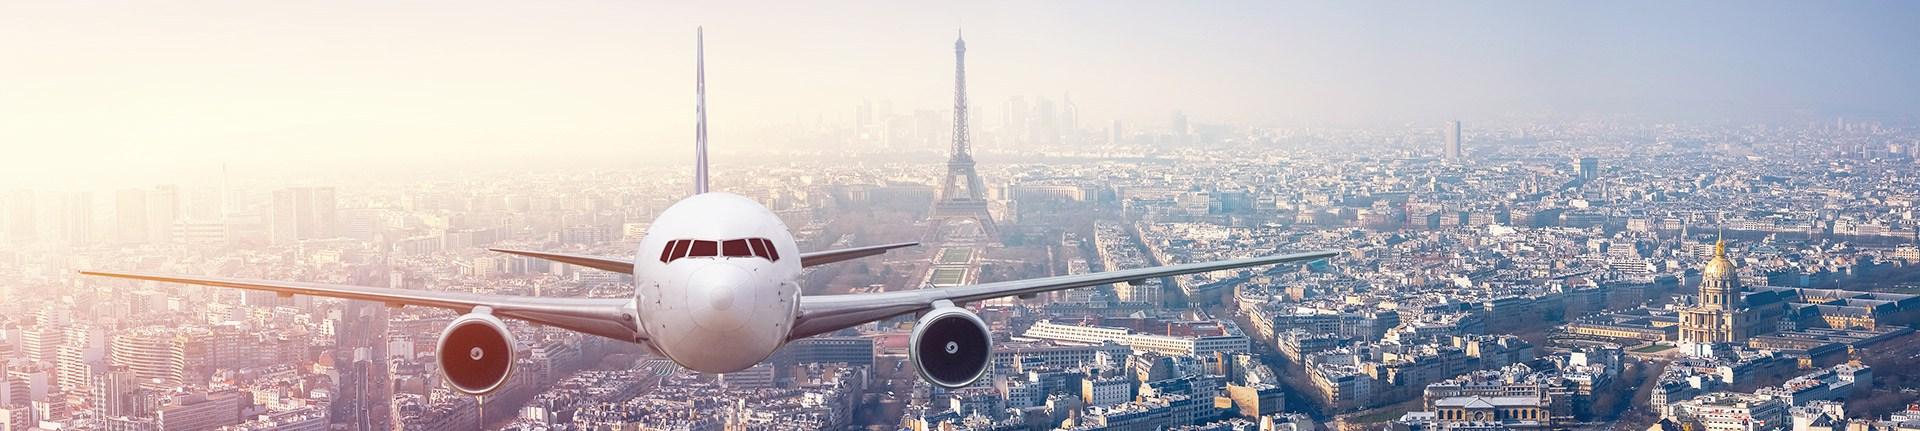 Air-France-case-study-banner